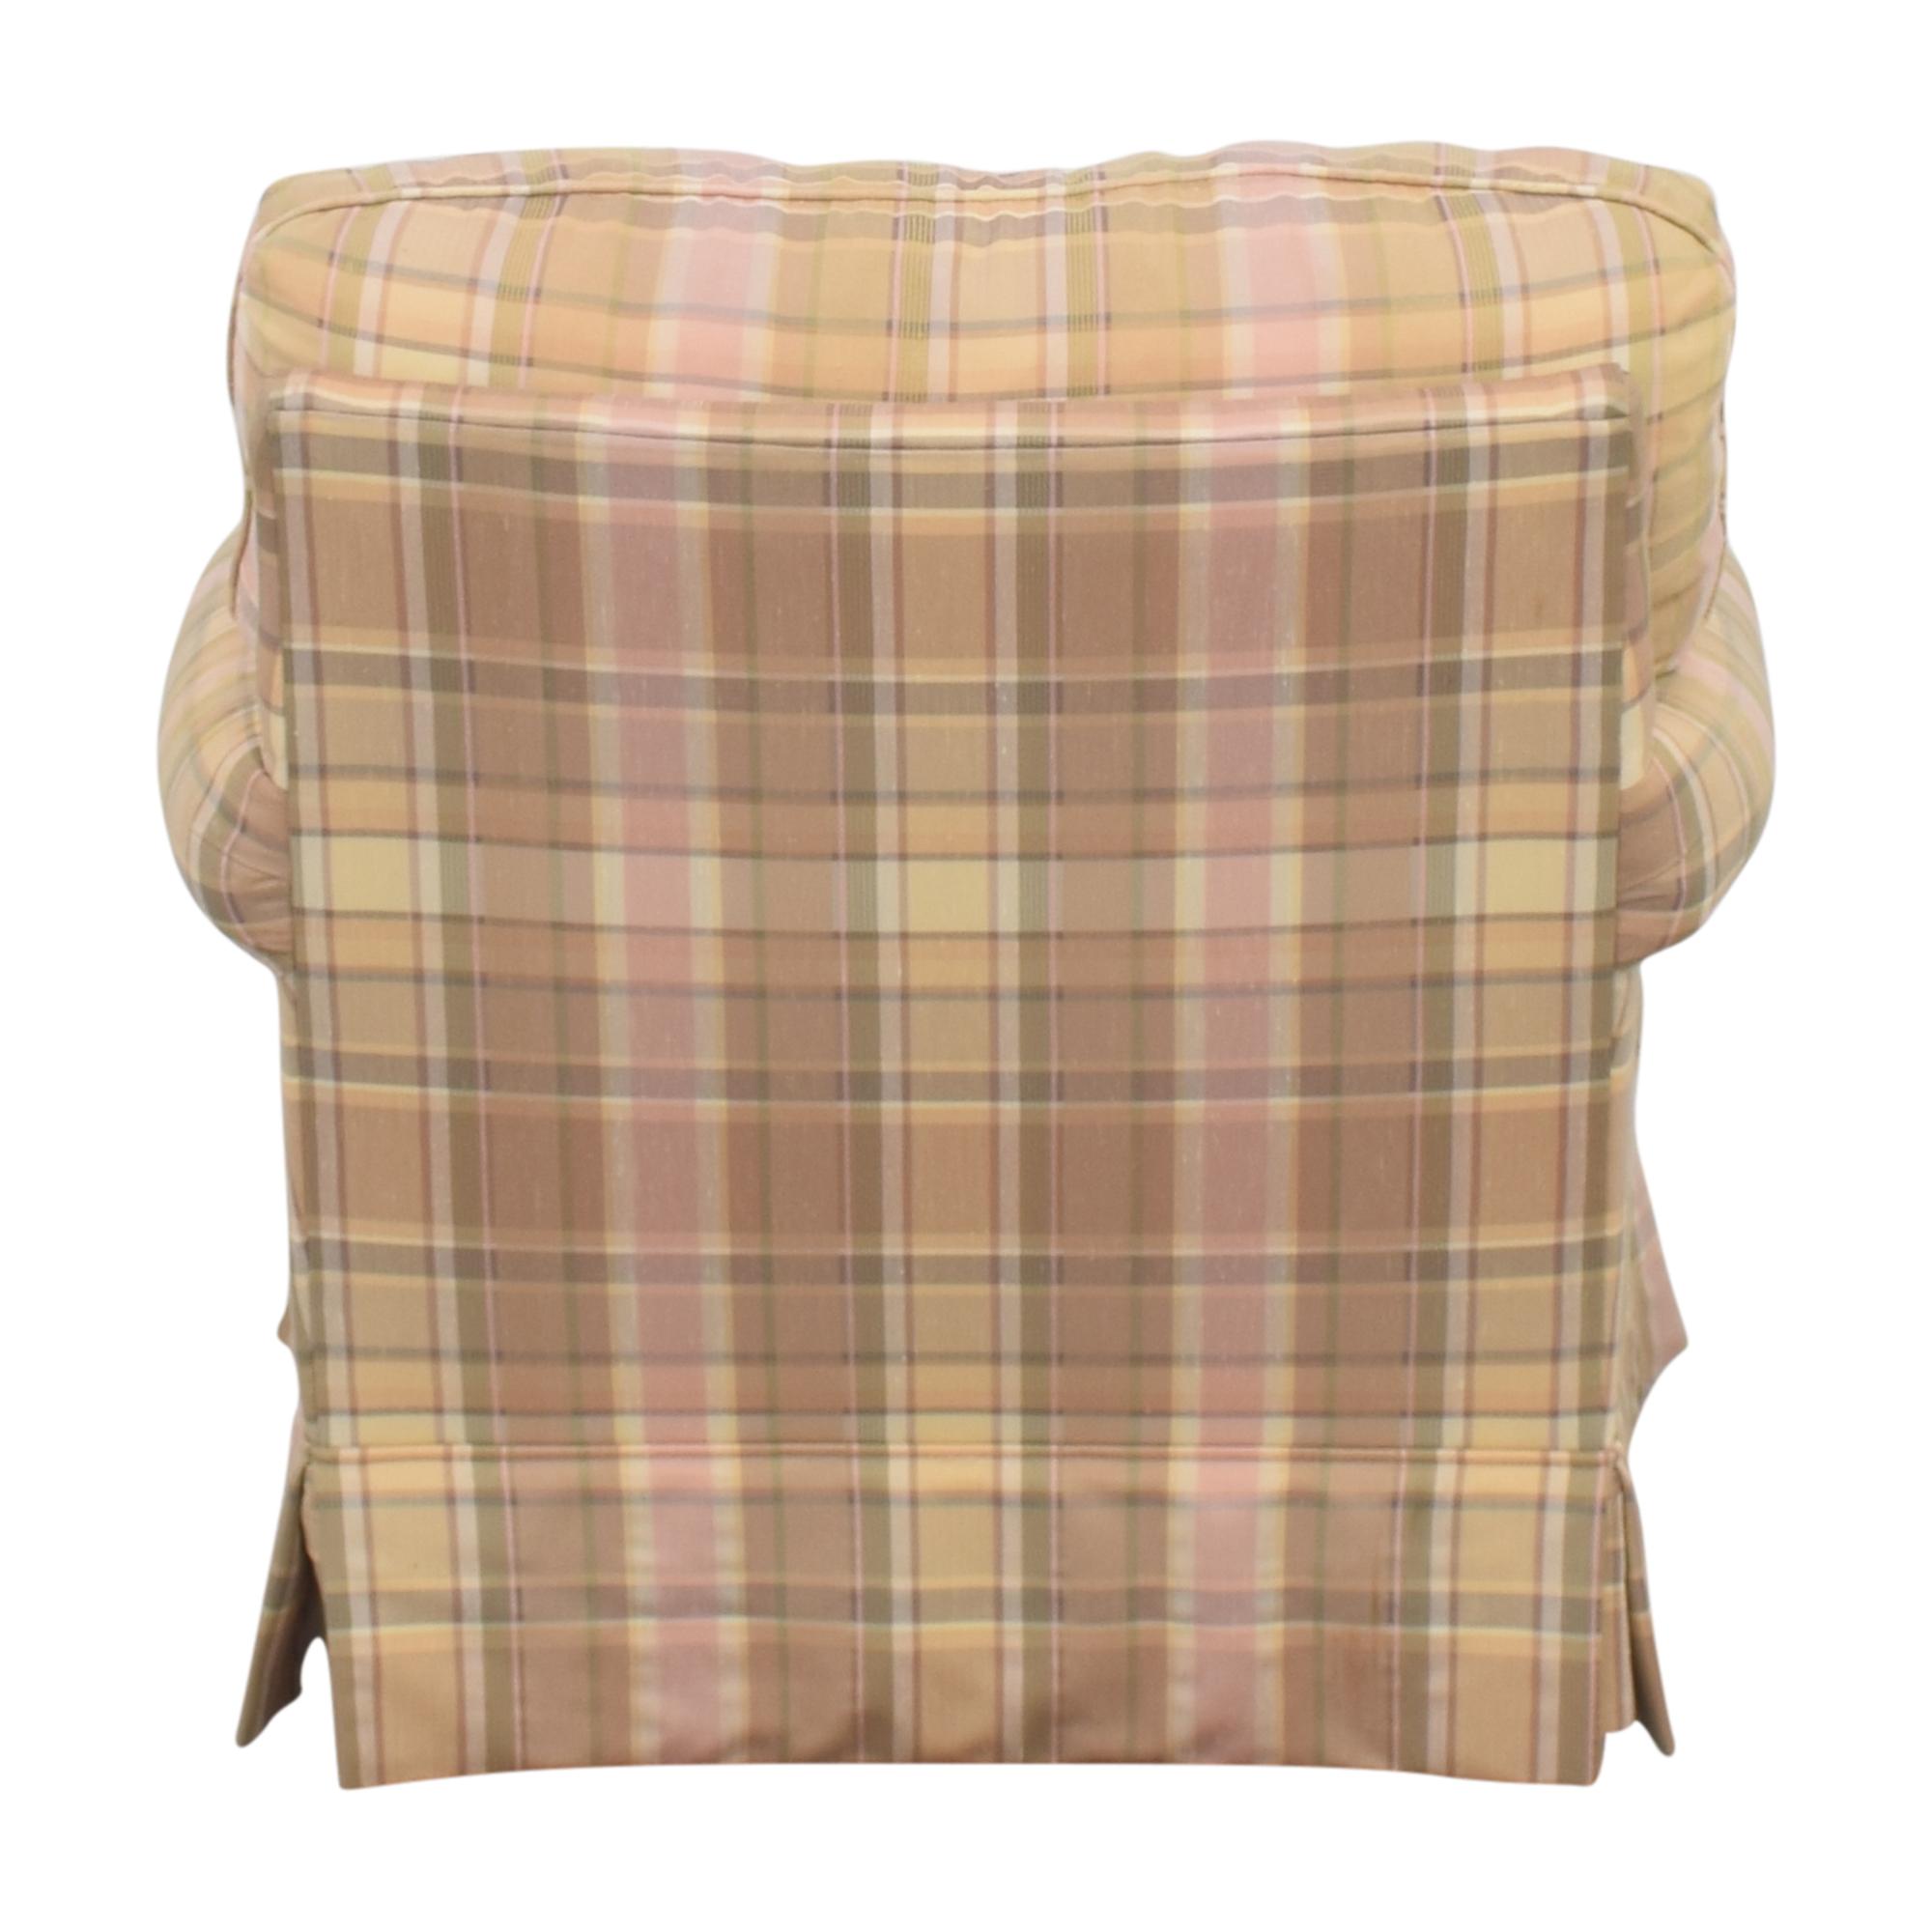 buy Thomasville Skirted Plaid Chair Thomasville